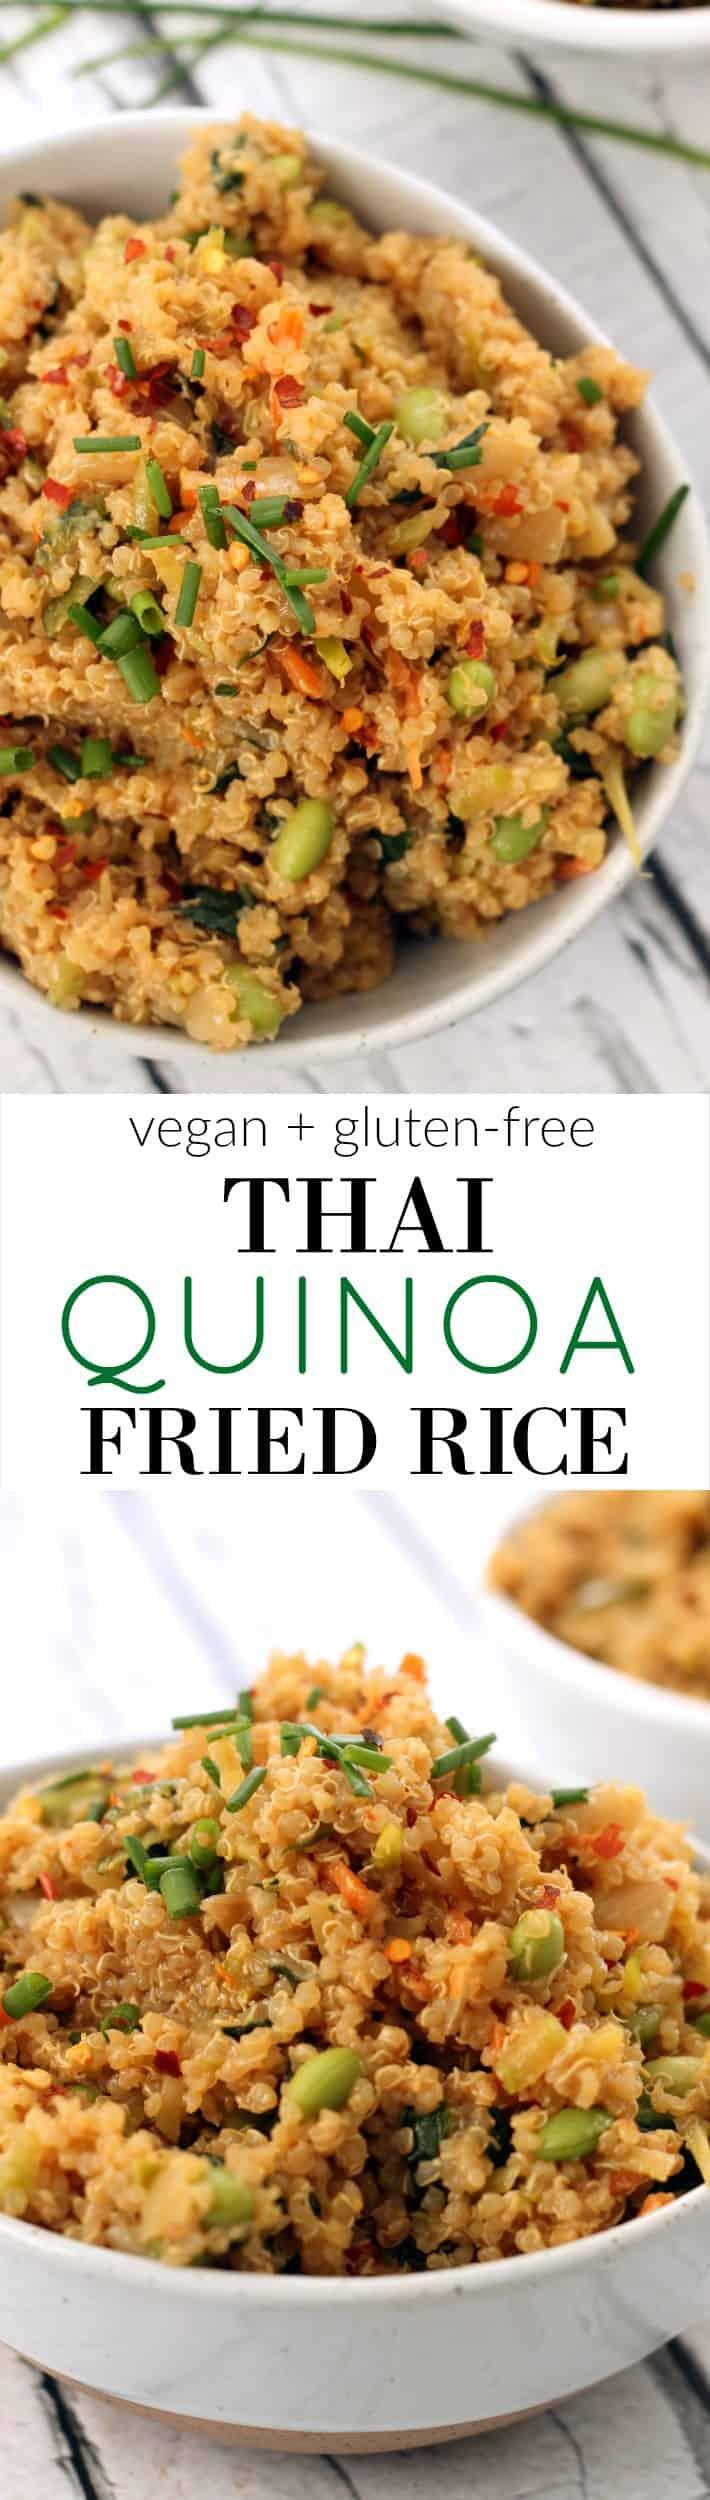 Thai Quinoa Fried Rice